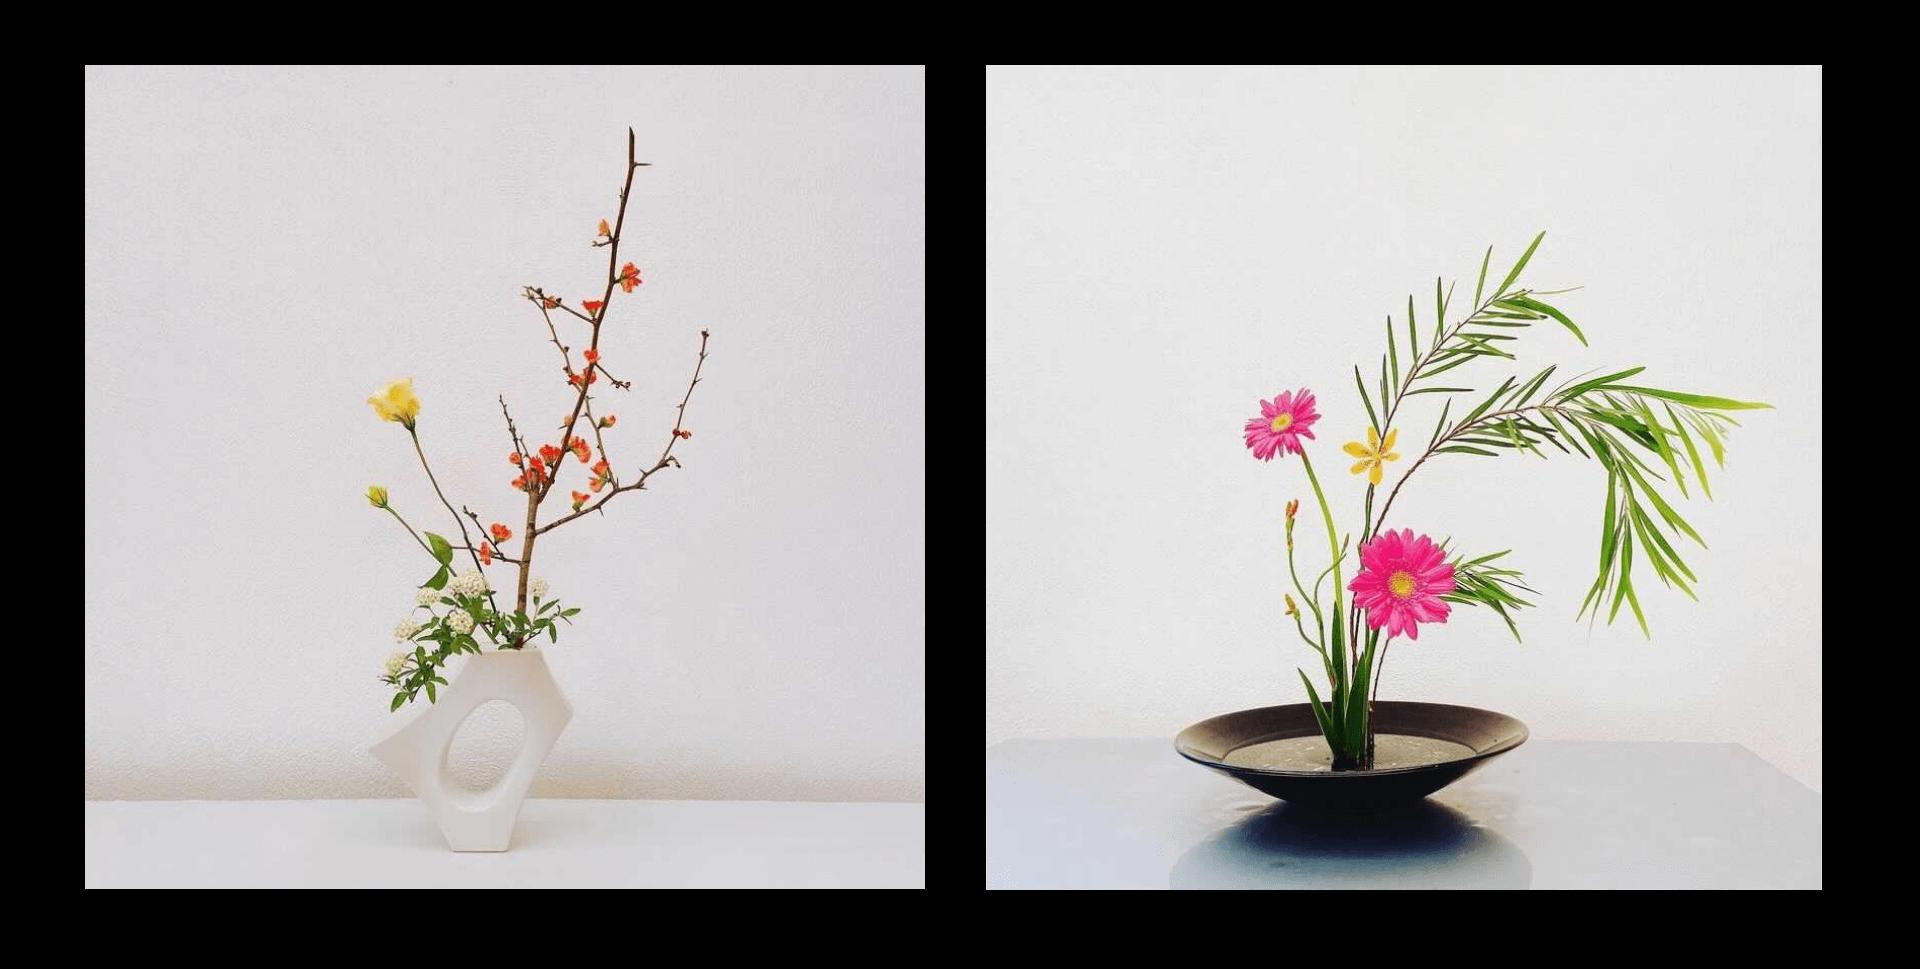 村上雄紀|趣味の生花